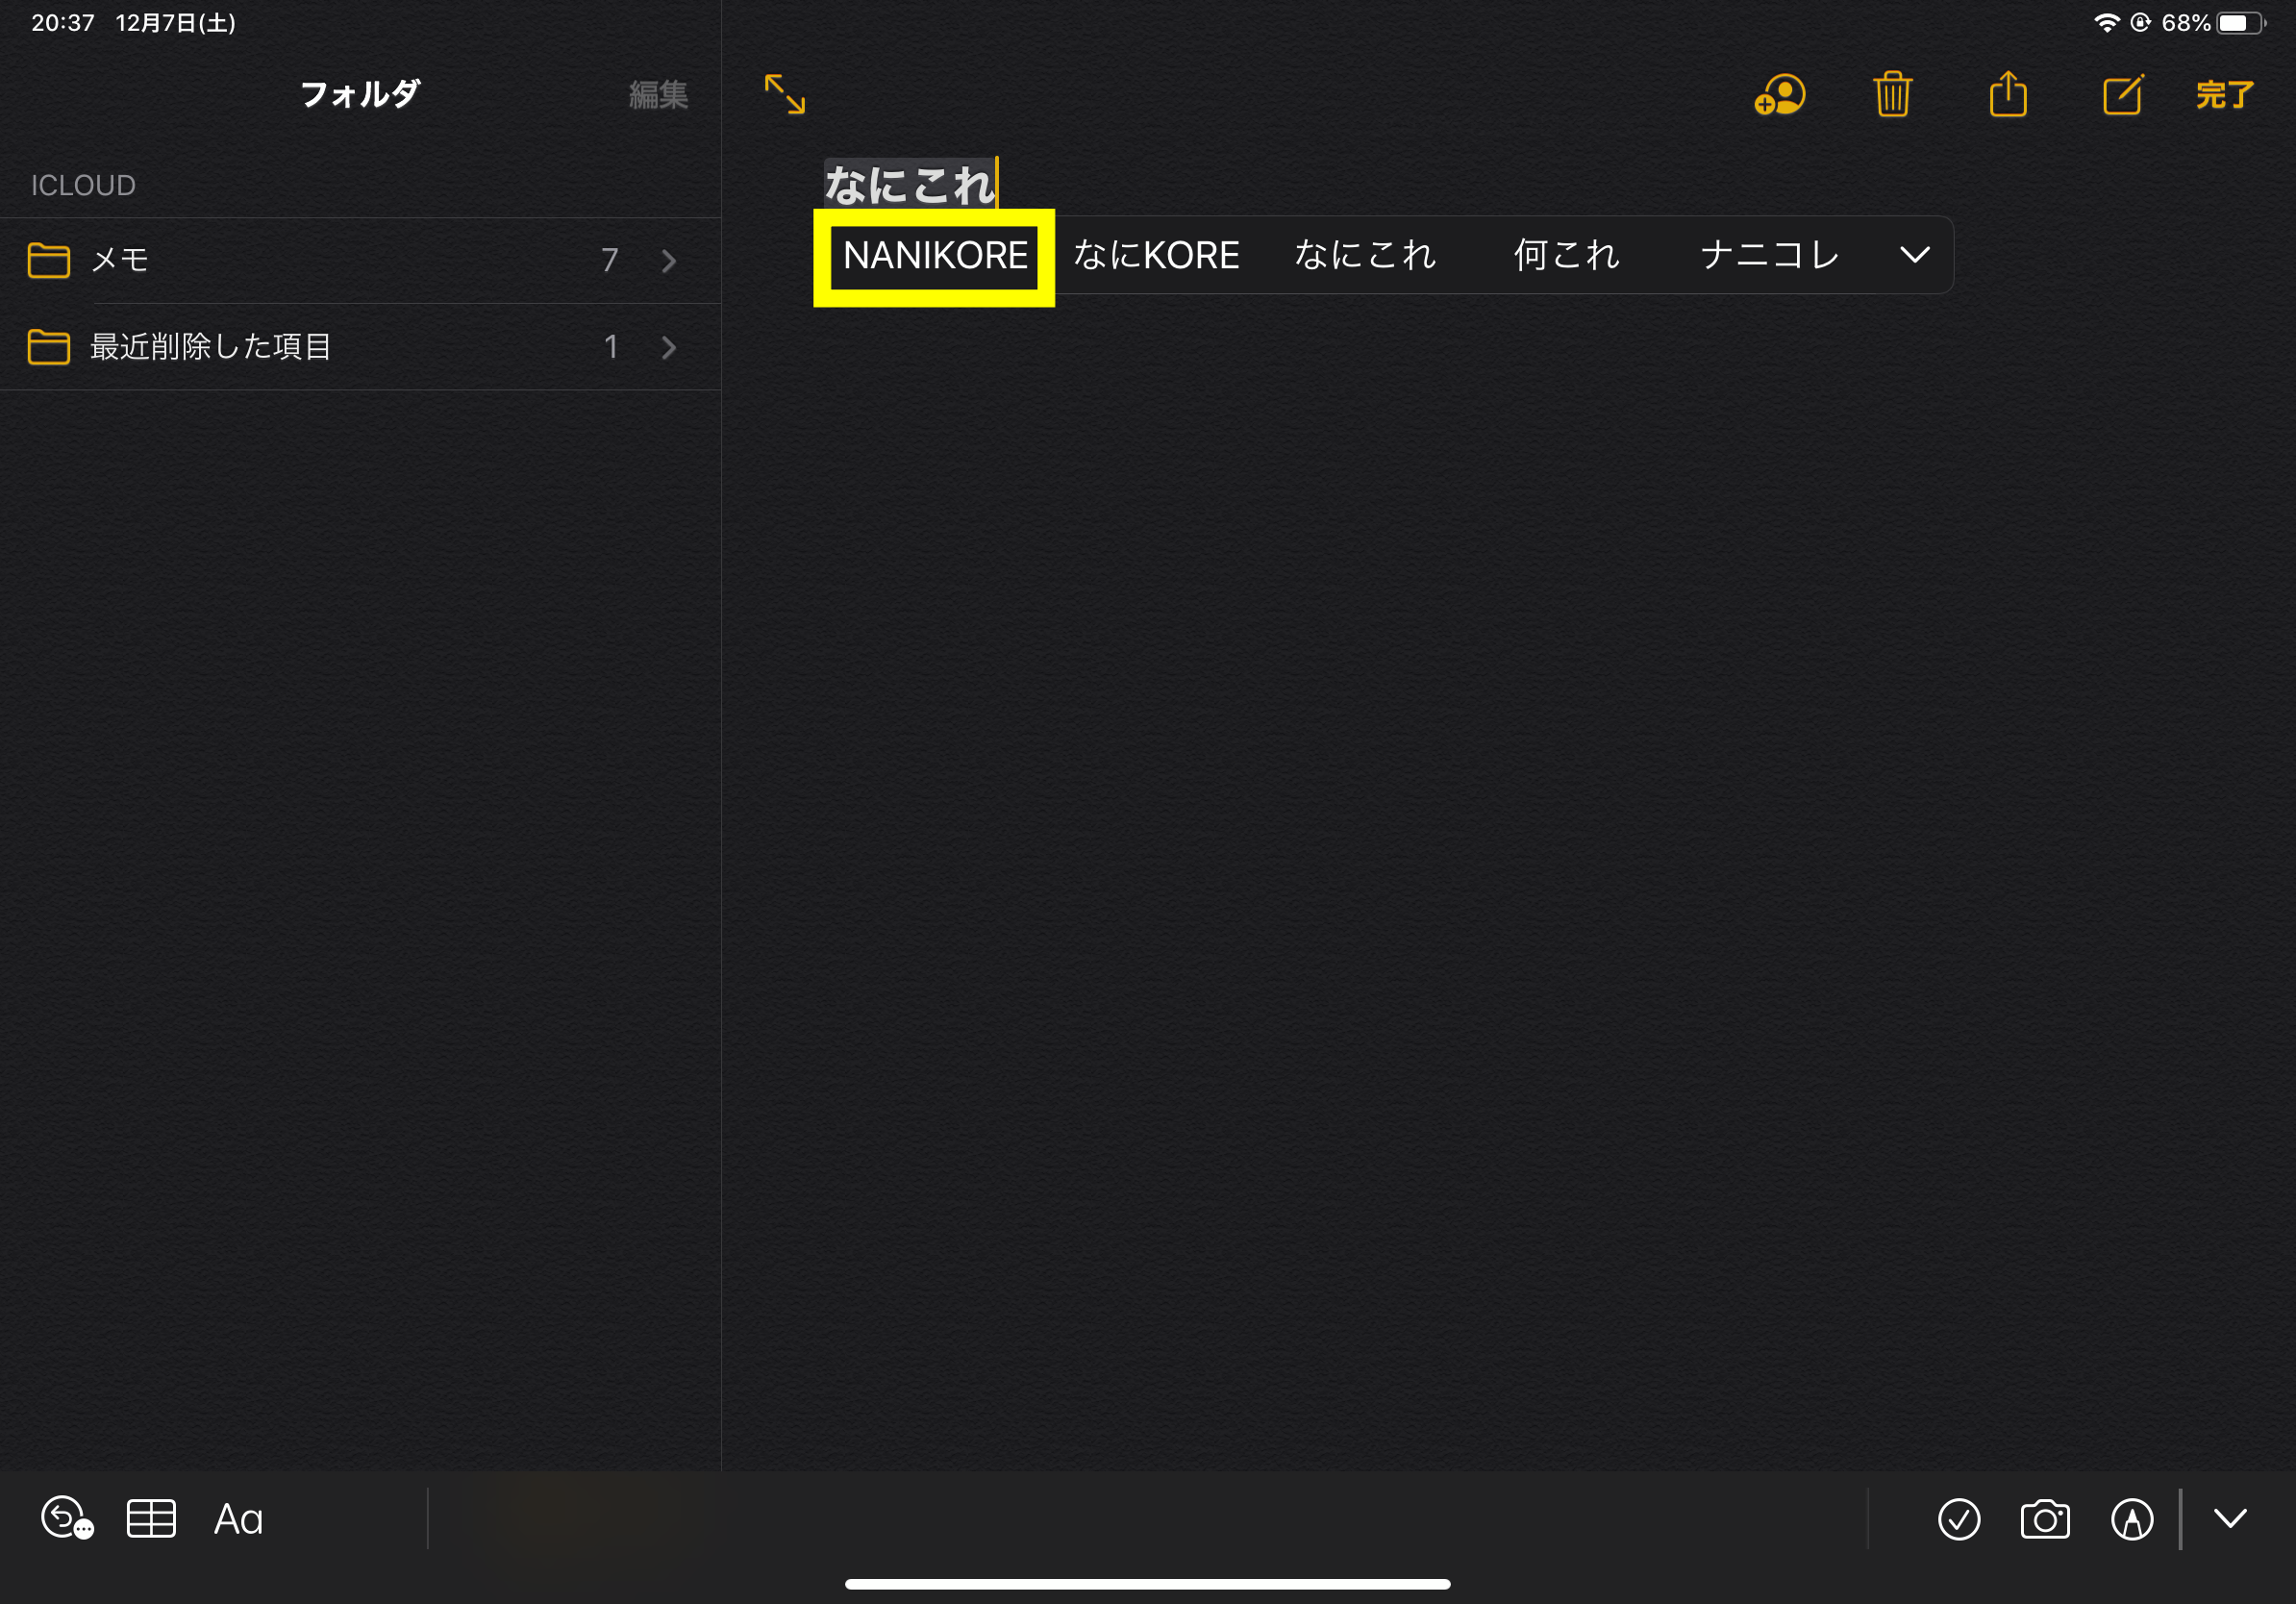 iPad ProのSmart Keyboard Folioで文字入力すると変換候補の最初にローマ字が表示される